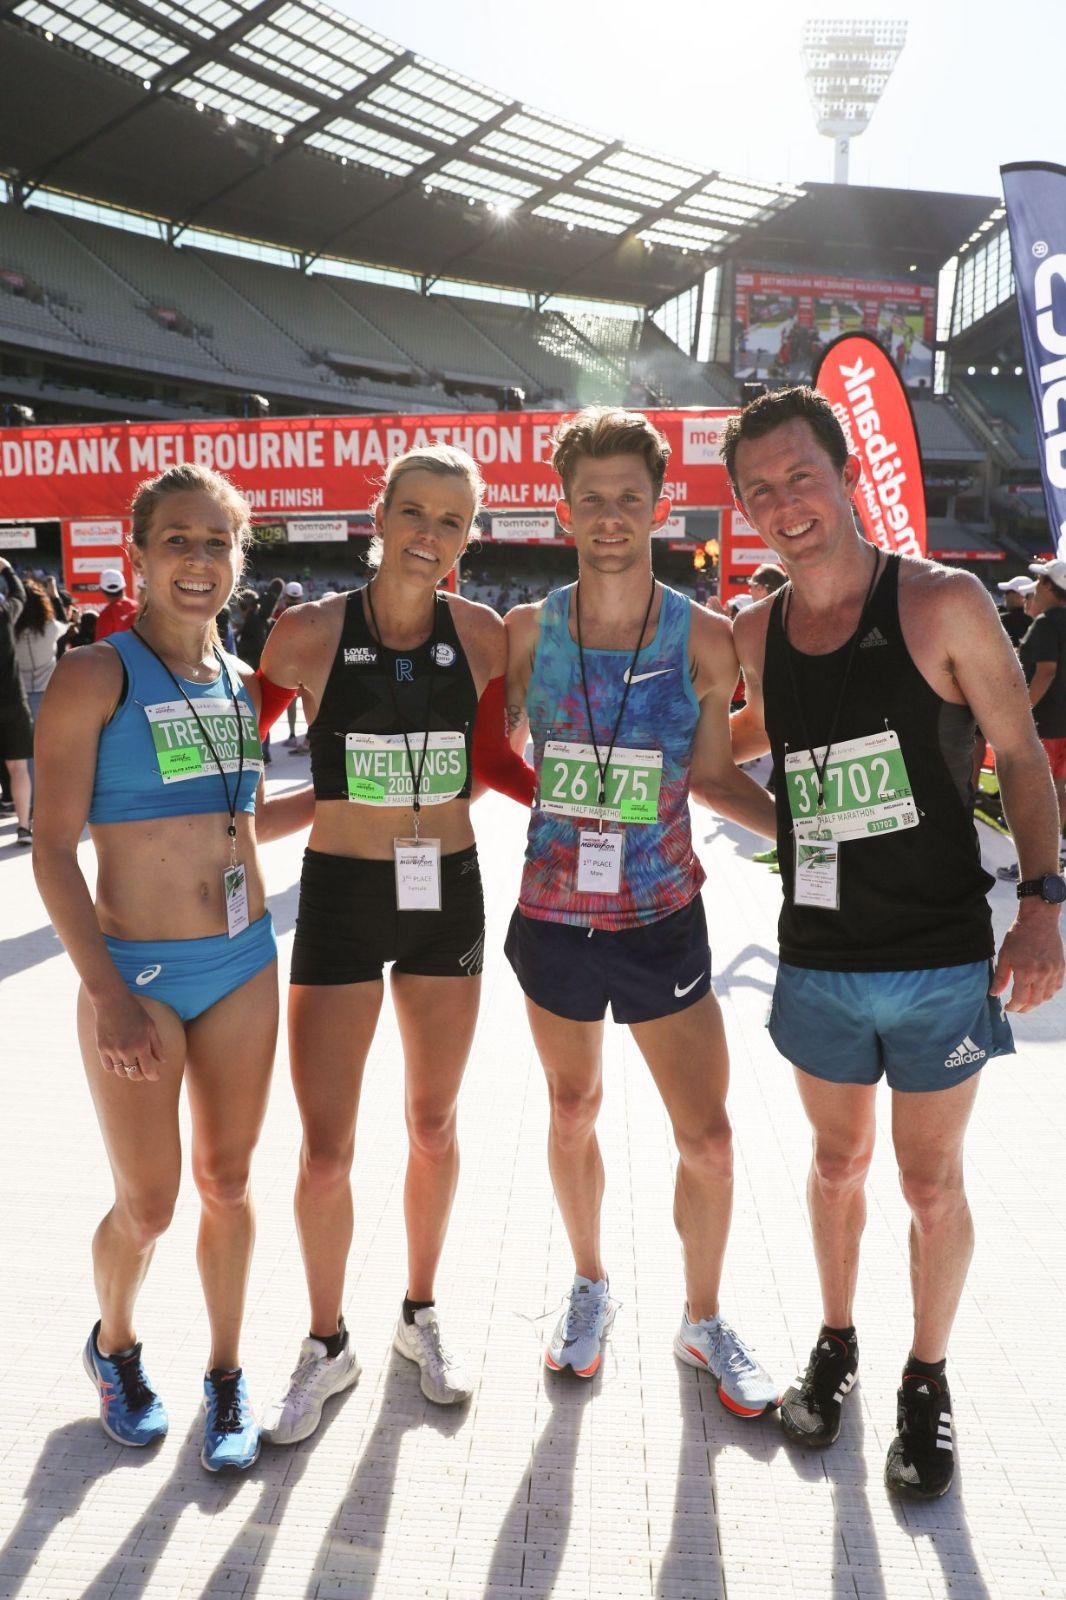 Melobourne marathon picture 7